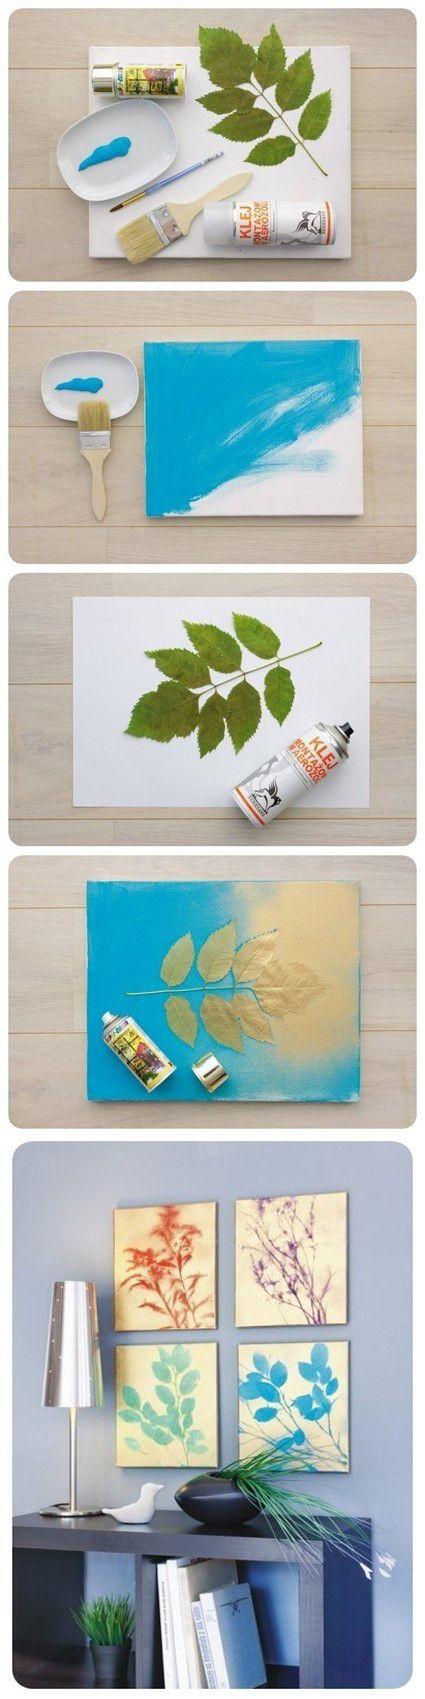 DIY wall painting easy.